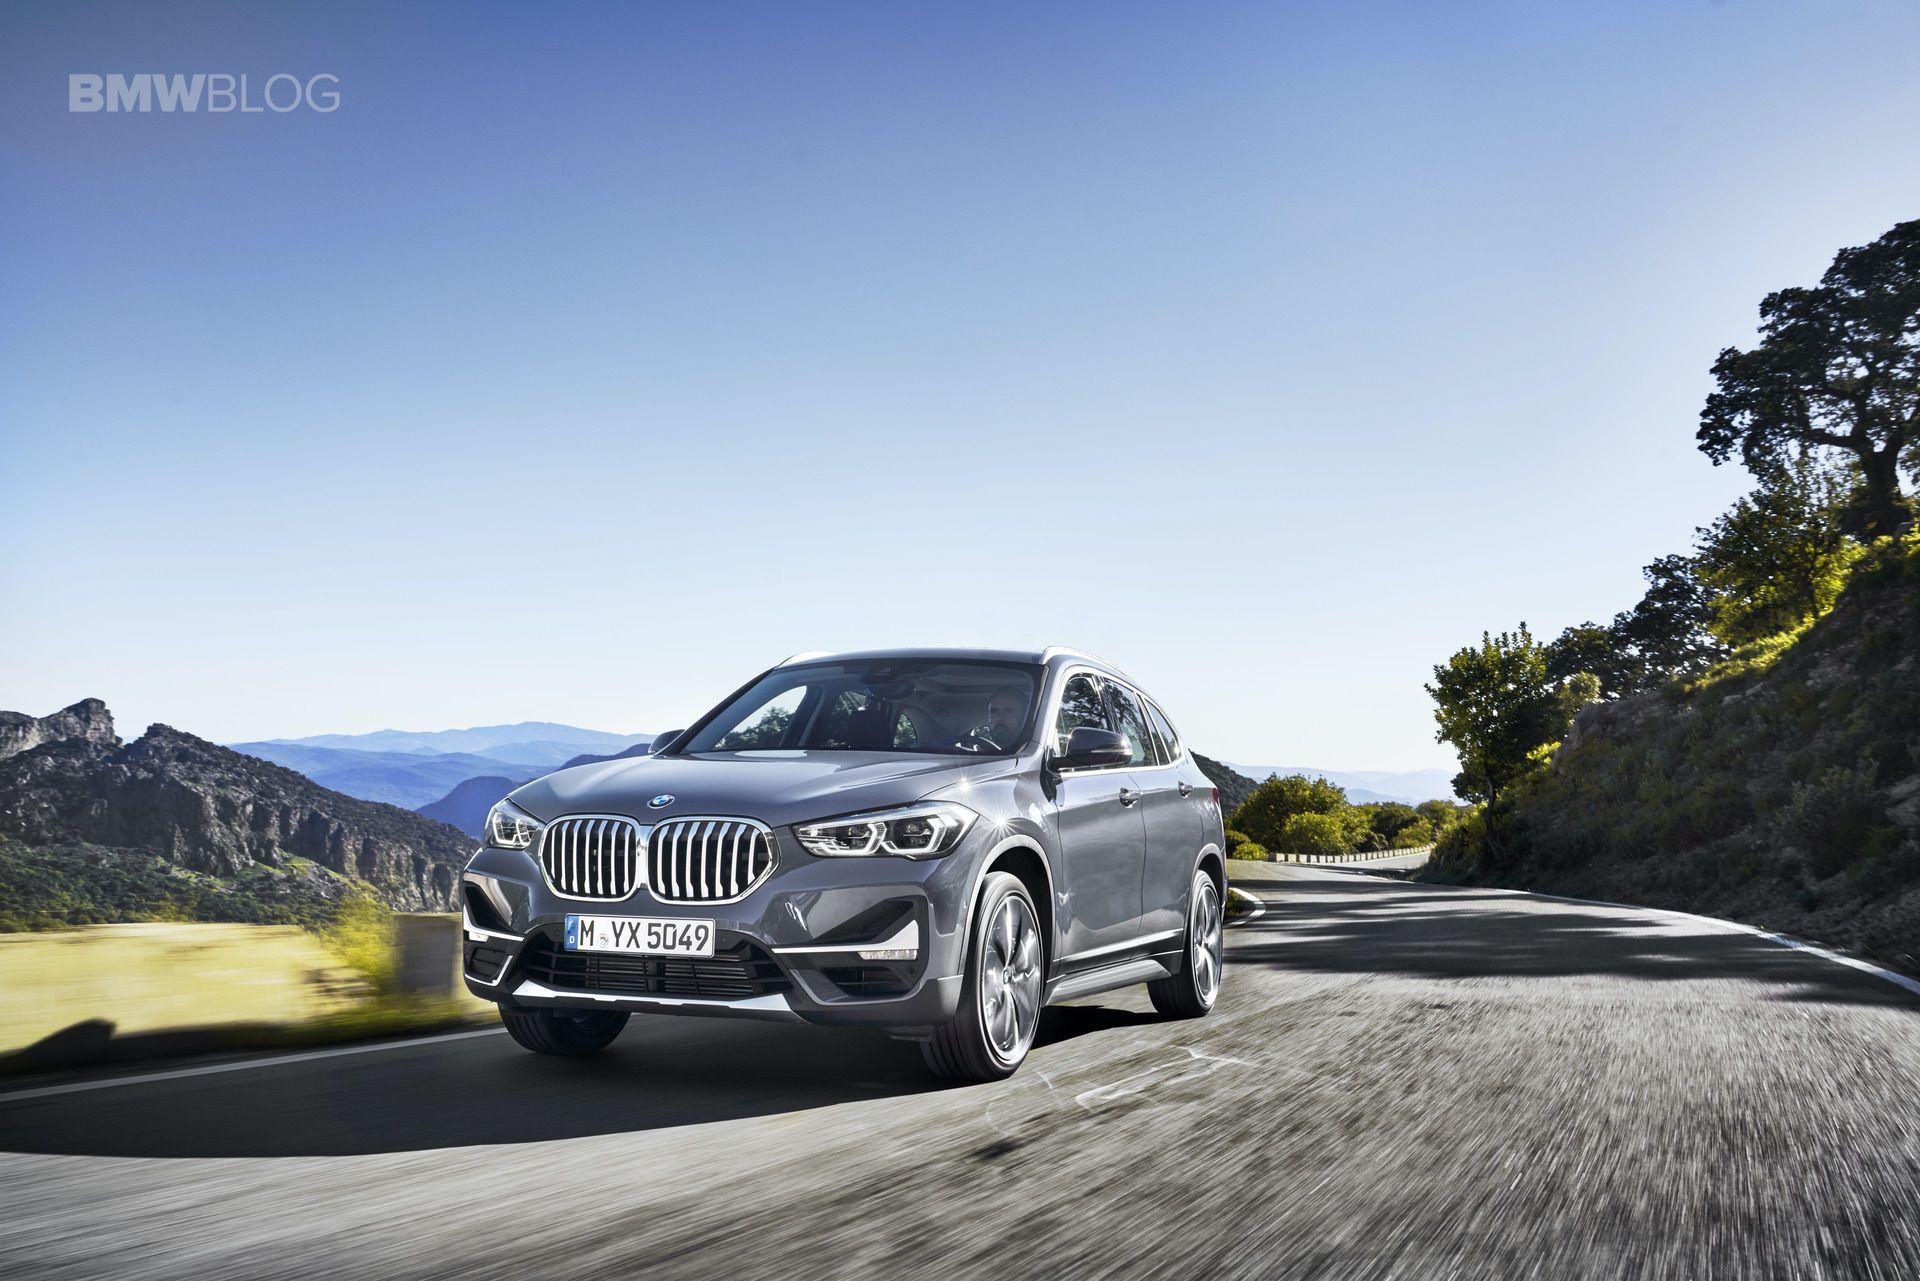 2019 BMW X1 Facelift exterior 01